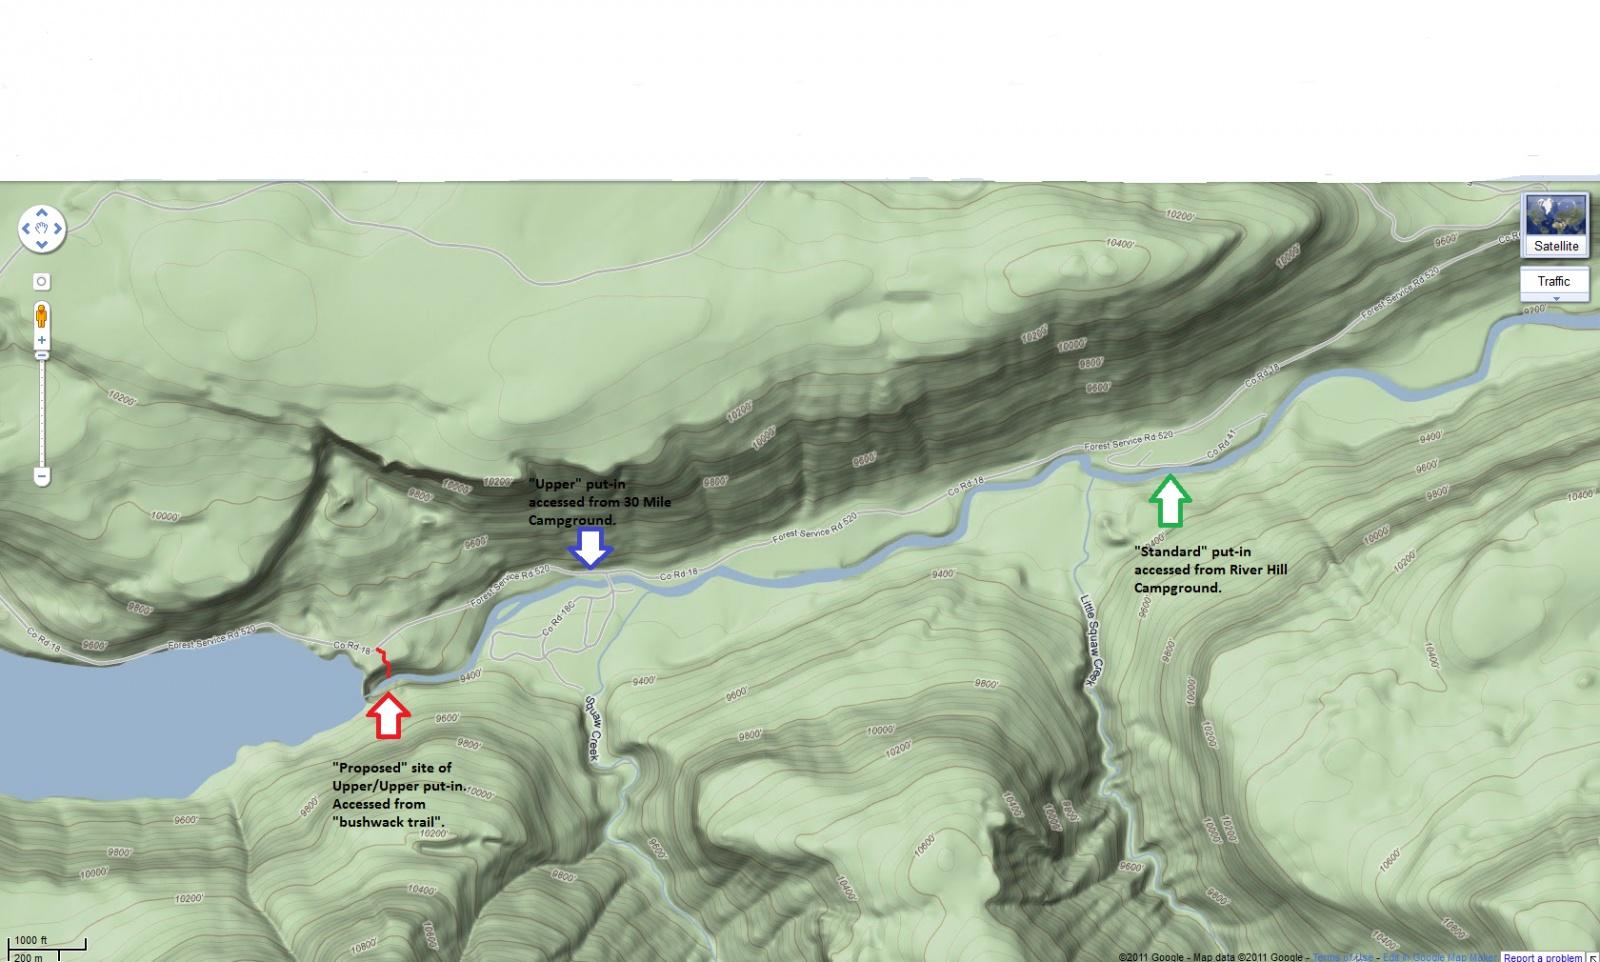 Click image for larger version  Name:Upper-Upper Rio Grande.jpg Views:327 Size:389.5 KB ID:3746